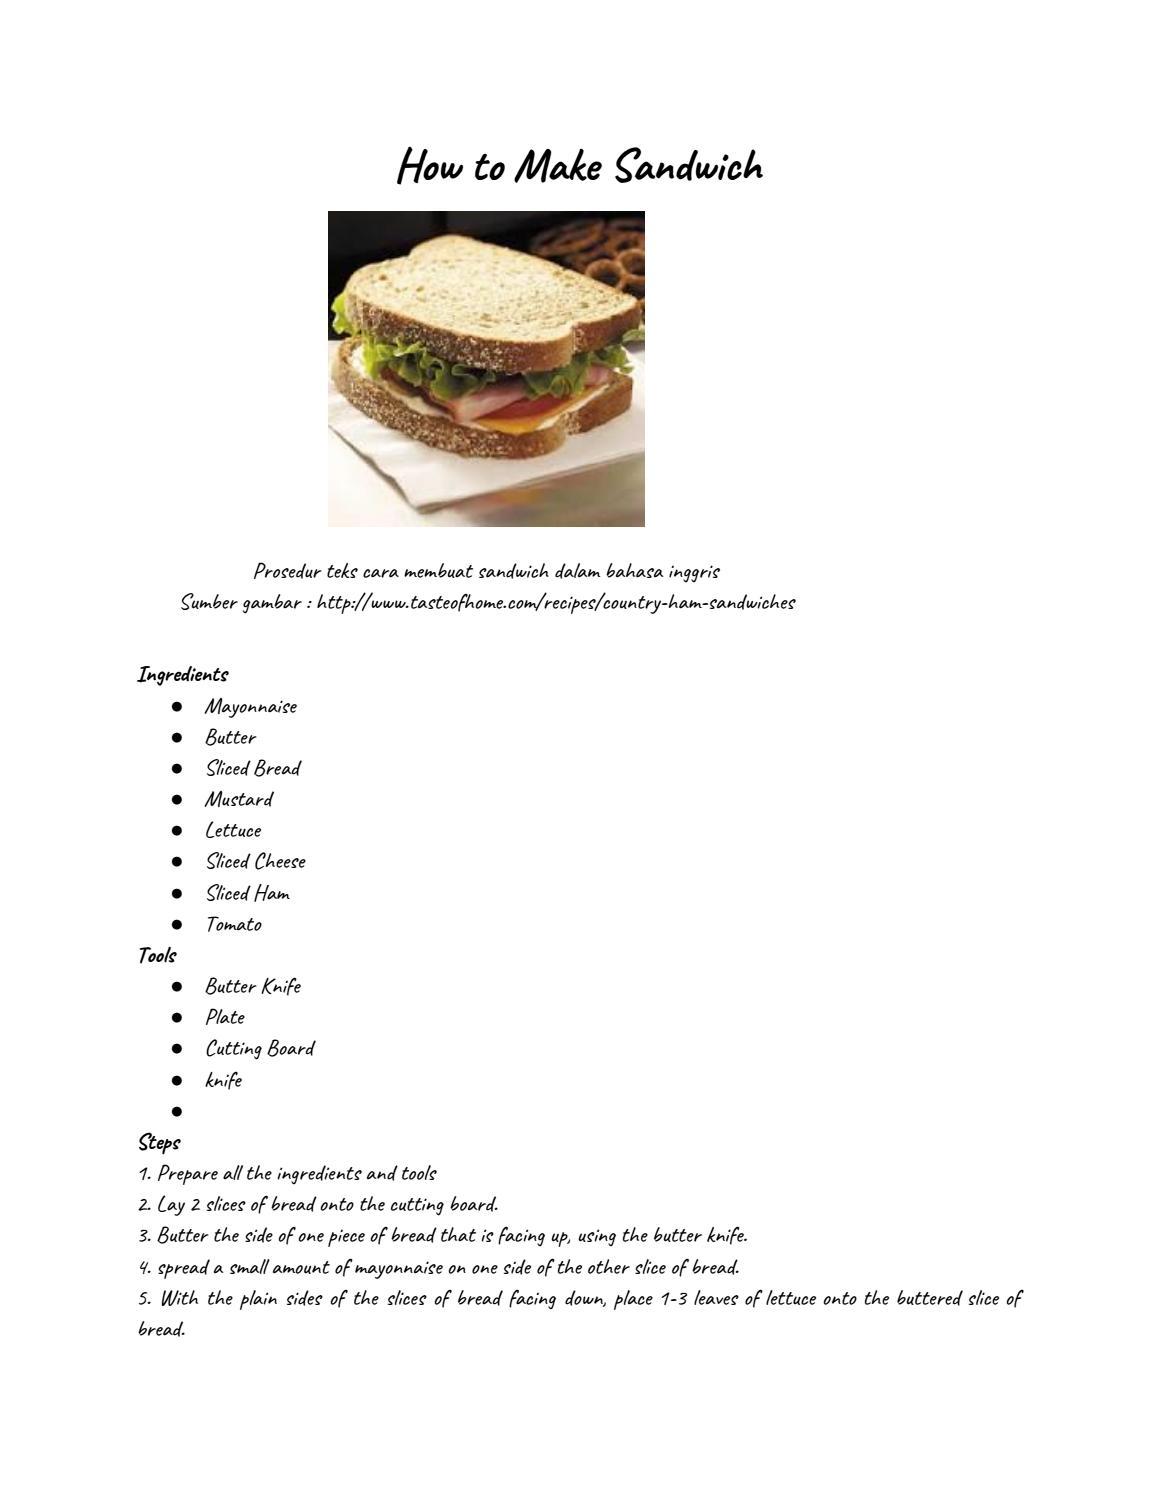 Procedure Text How To Make Sandwich : procedure, sandwich, Sandwich, Billjfranke, Issuu